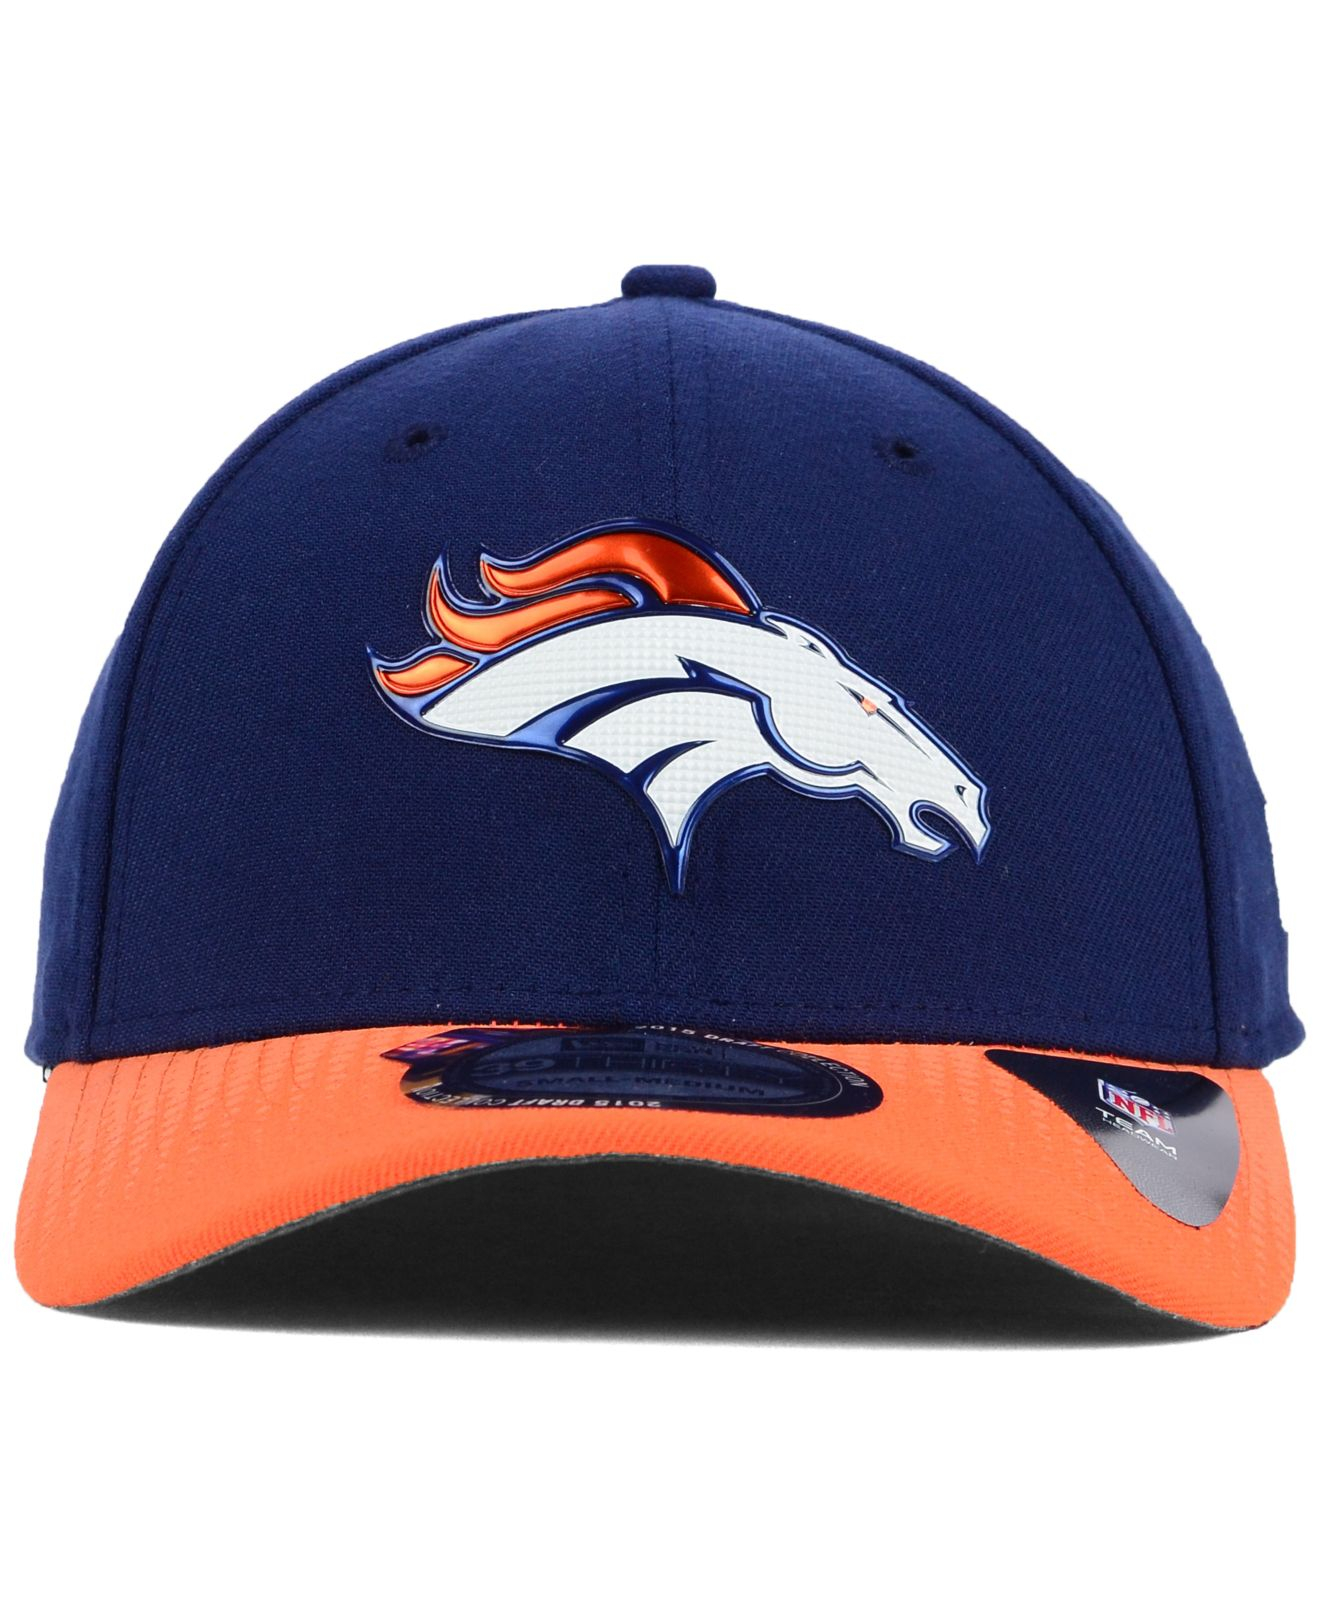 ... lyst ktz denver broncos 2015 nfl draft 39thirty cap in blue for men 2c814f906